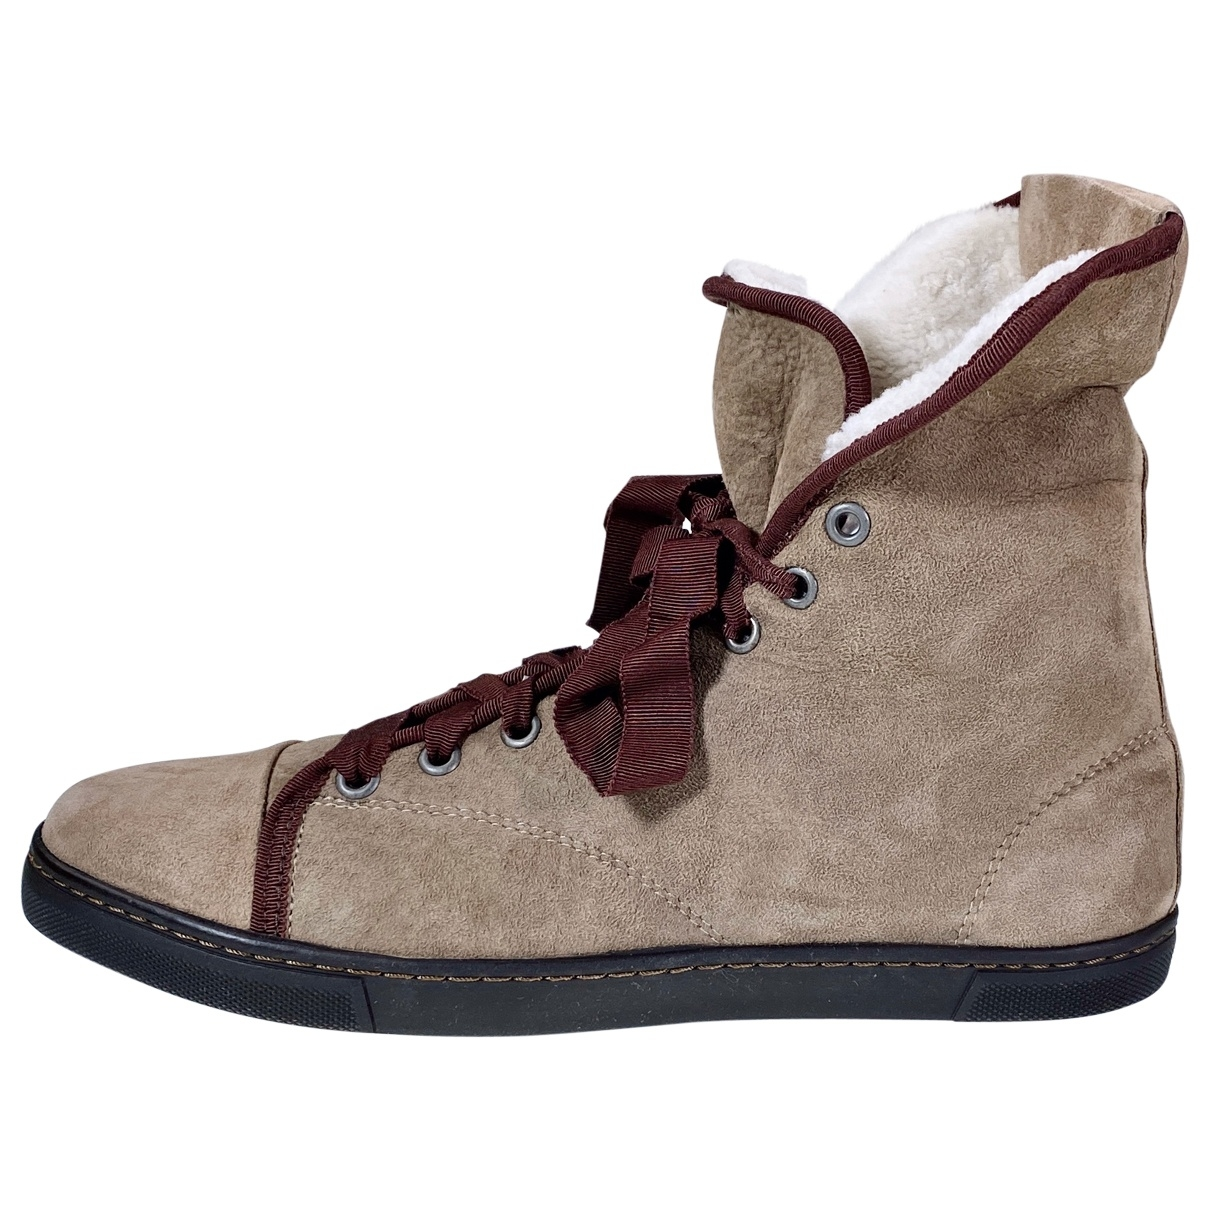 Lanvin \N Sneakers in  Beige Schaf